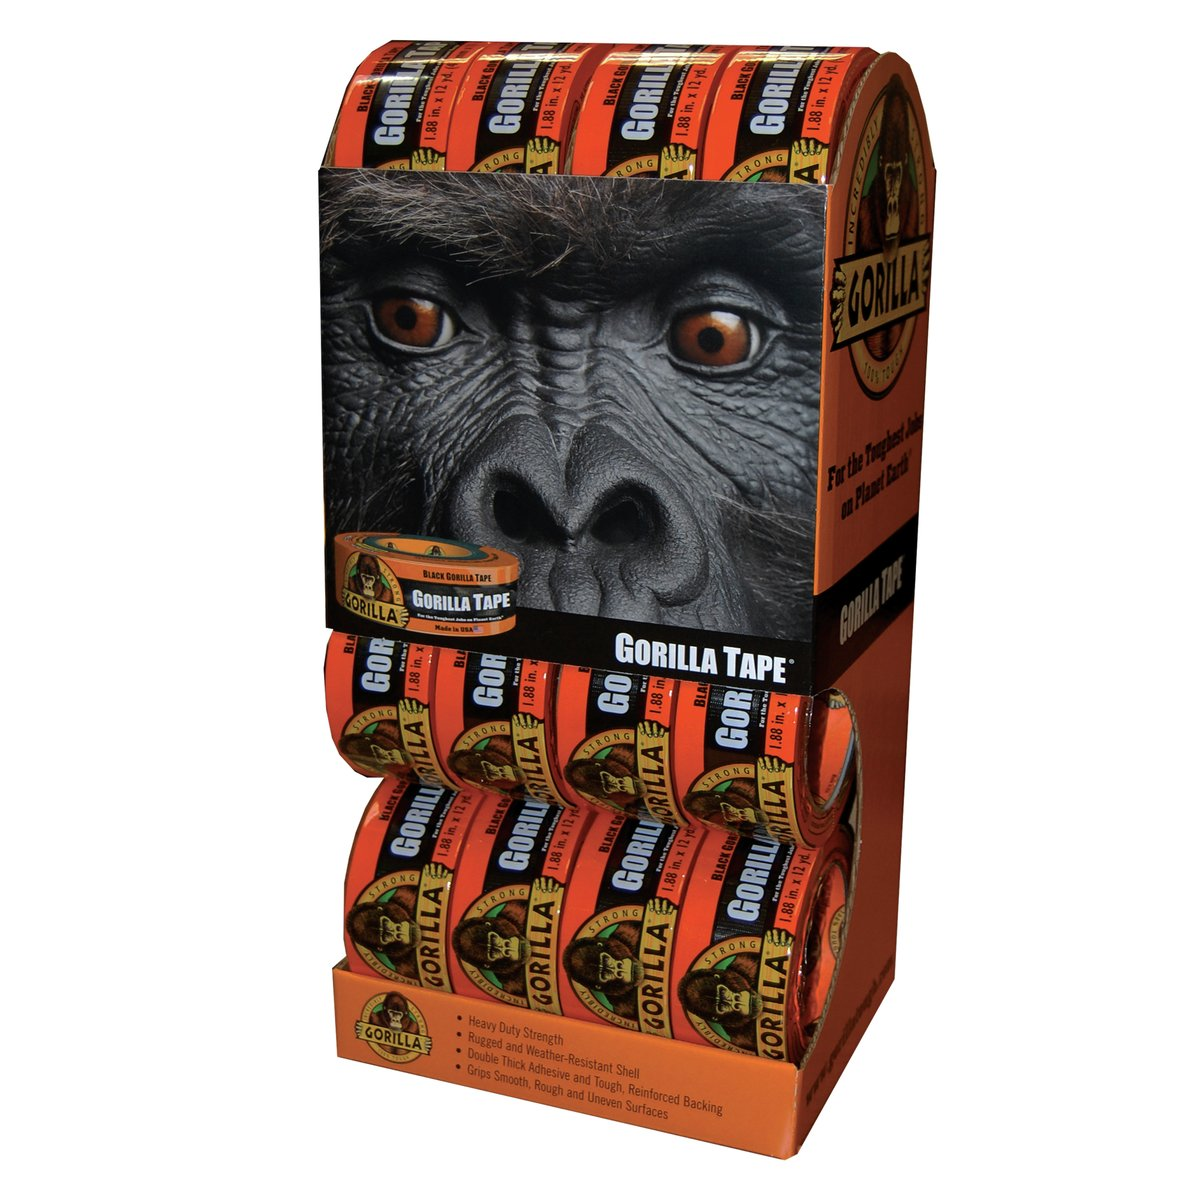 Gorilla Tape, Black Duct Tape, 1.88'' x 12 yd, Black, (Bulk Pack of 16) by Gorilla (Image #6)